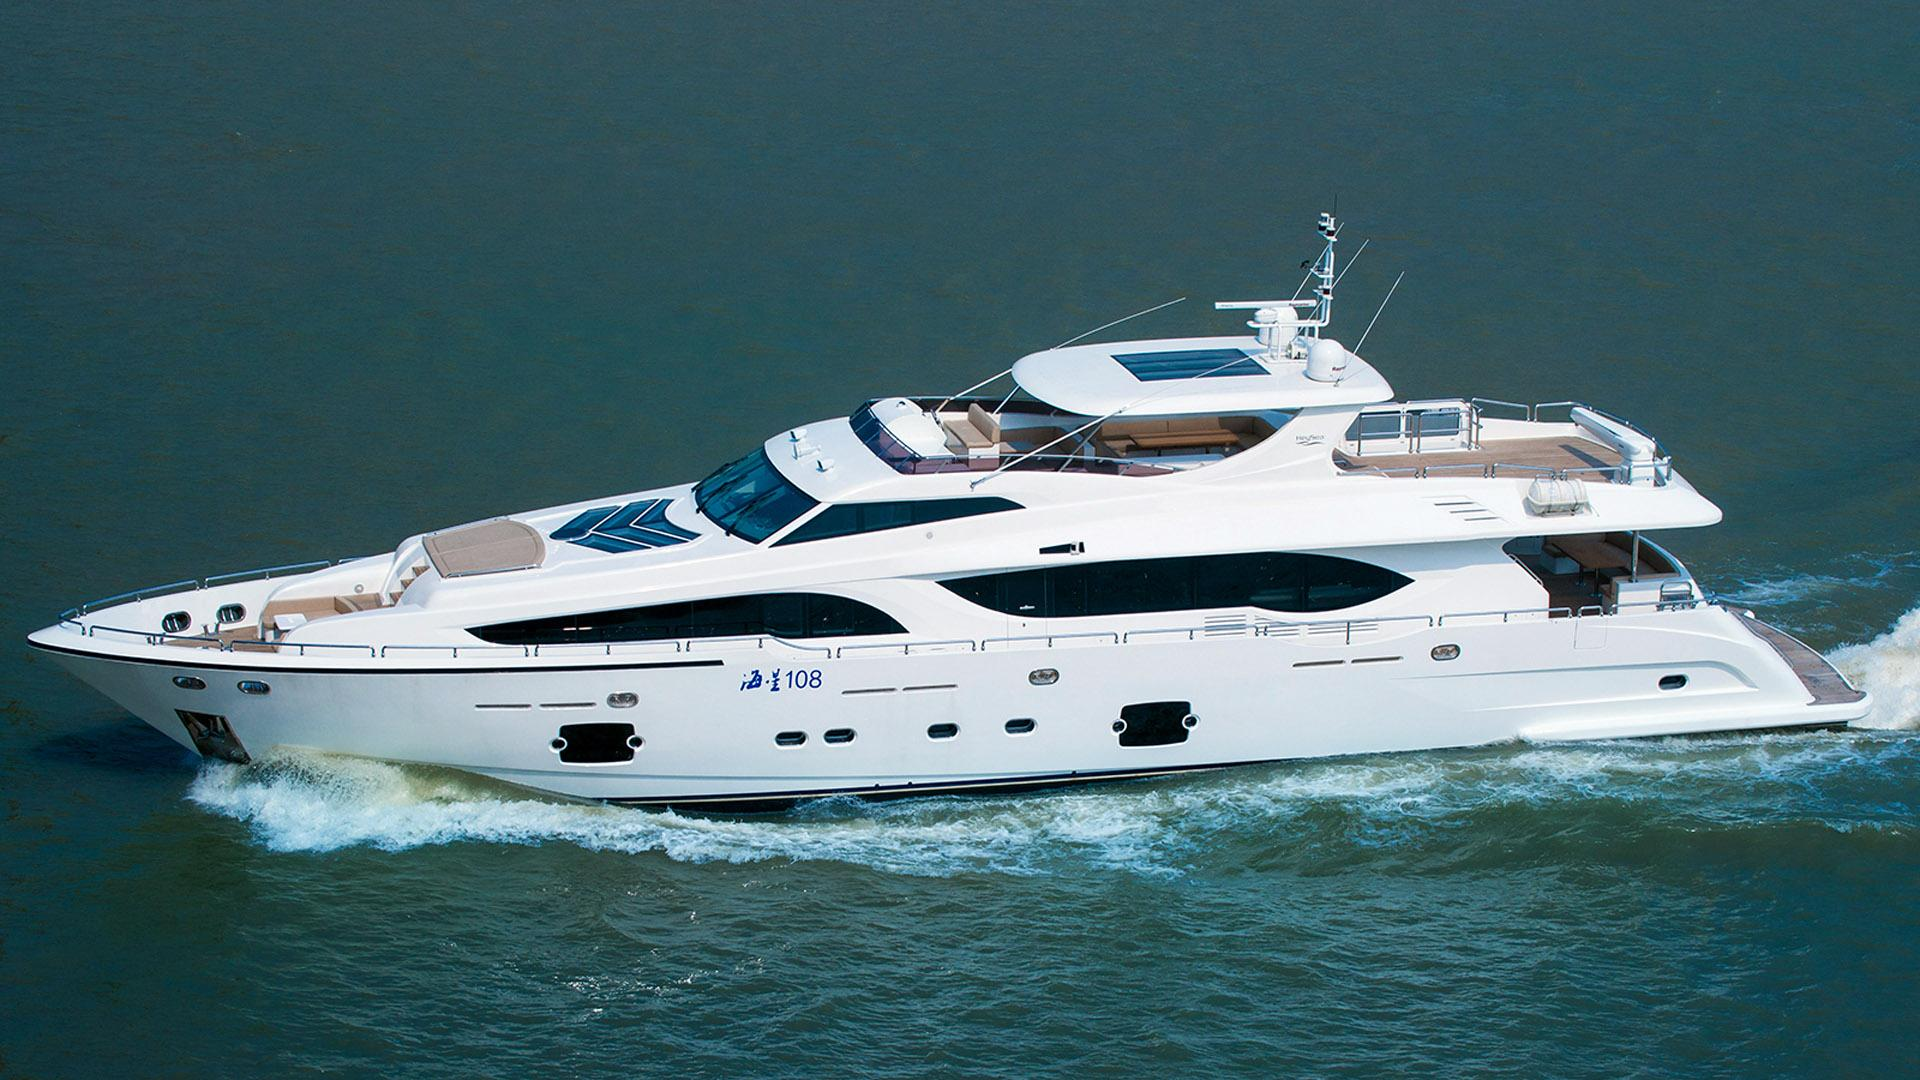 fantasy 110 motoryacht heysea 2014 33m profile sistership